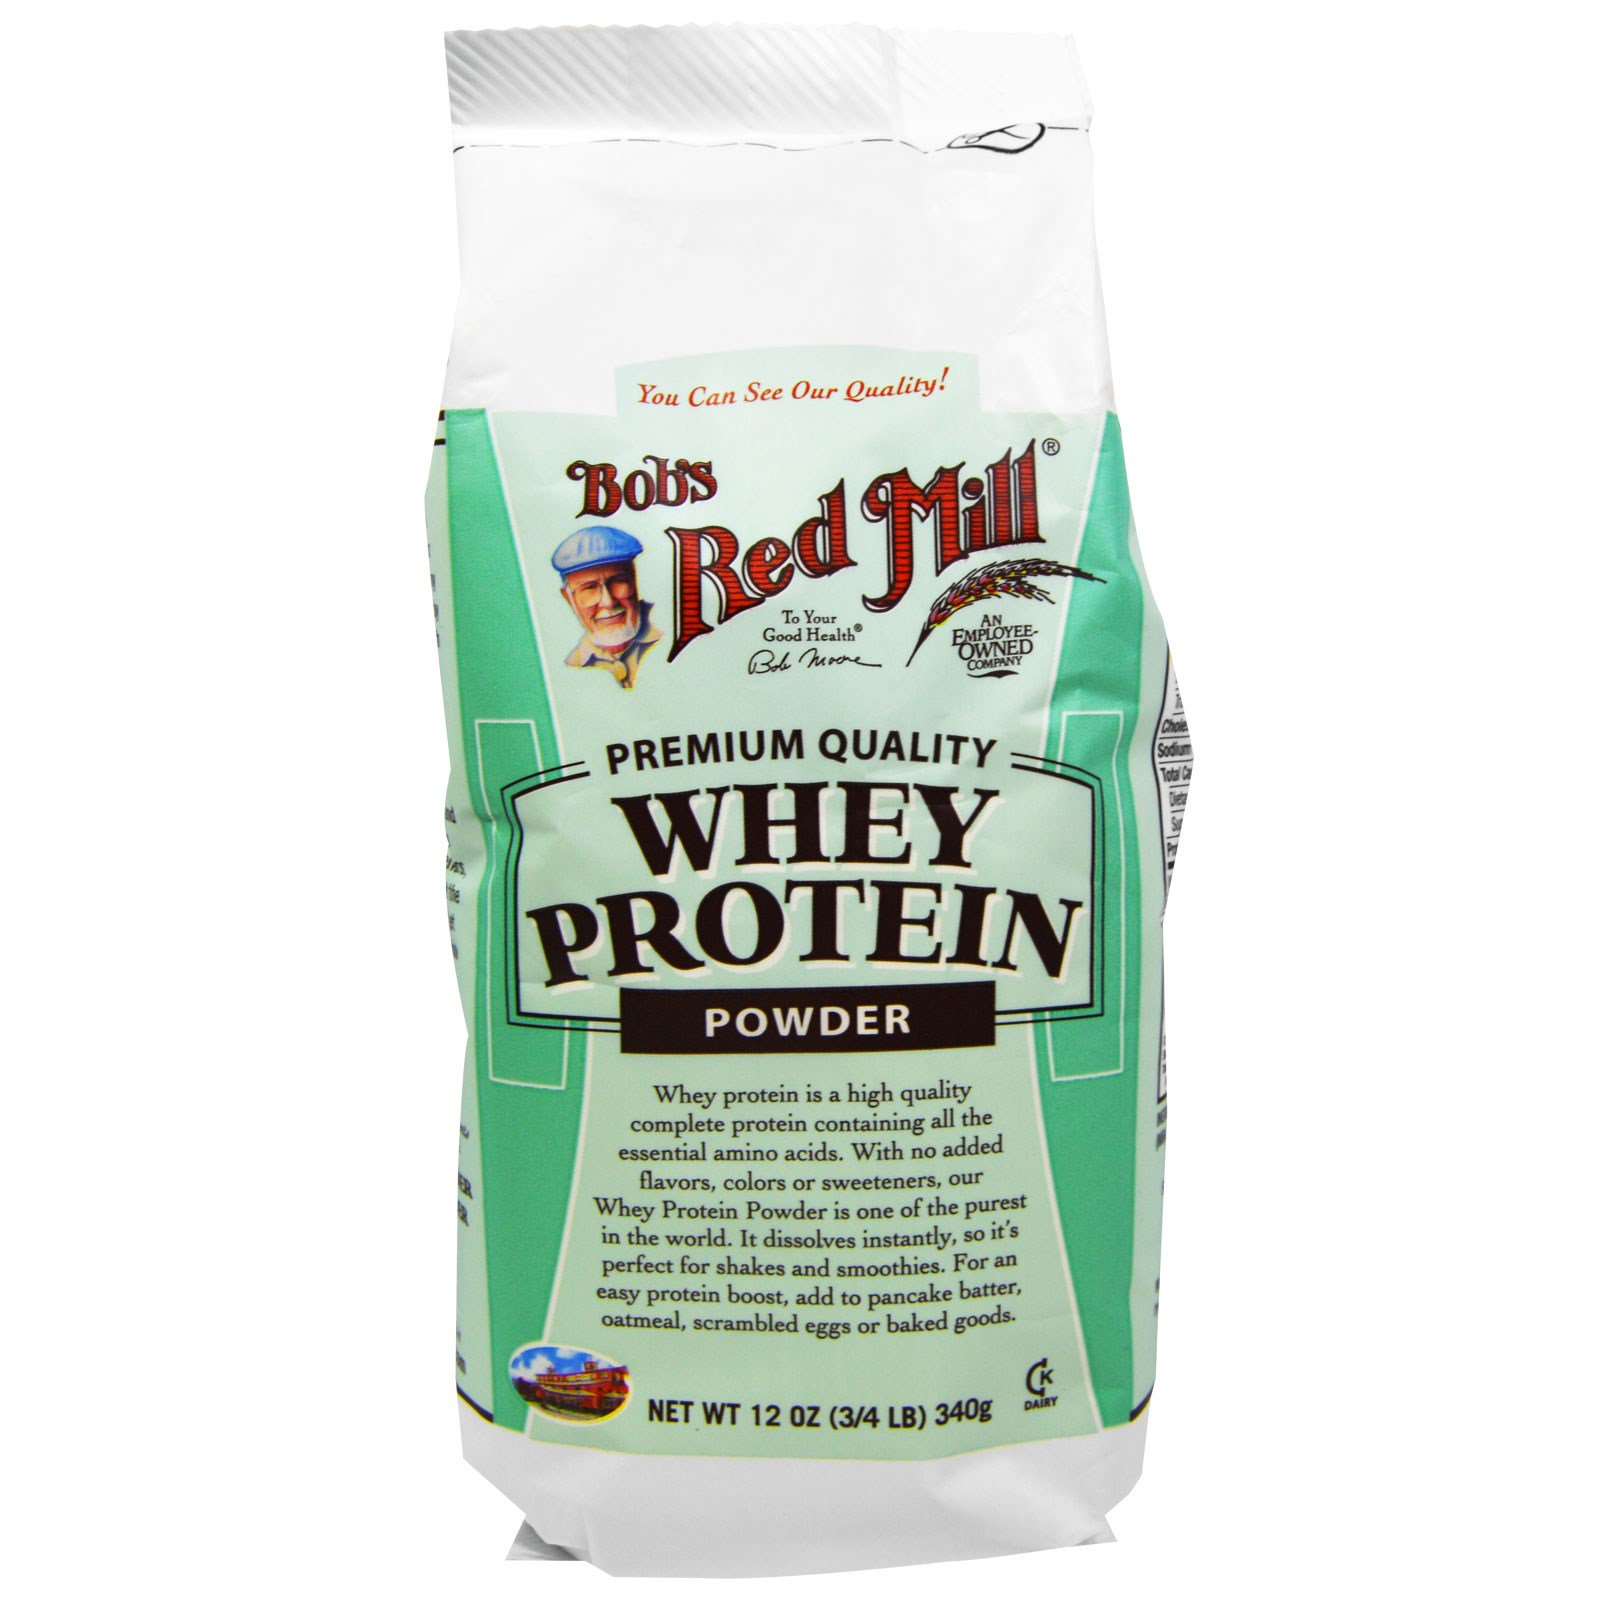 Bob's Red Mill, Whey Protein Powder, 12 oz (340 g)